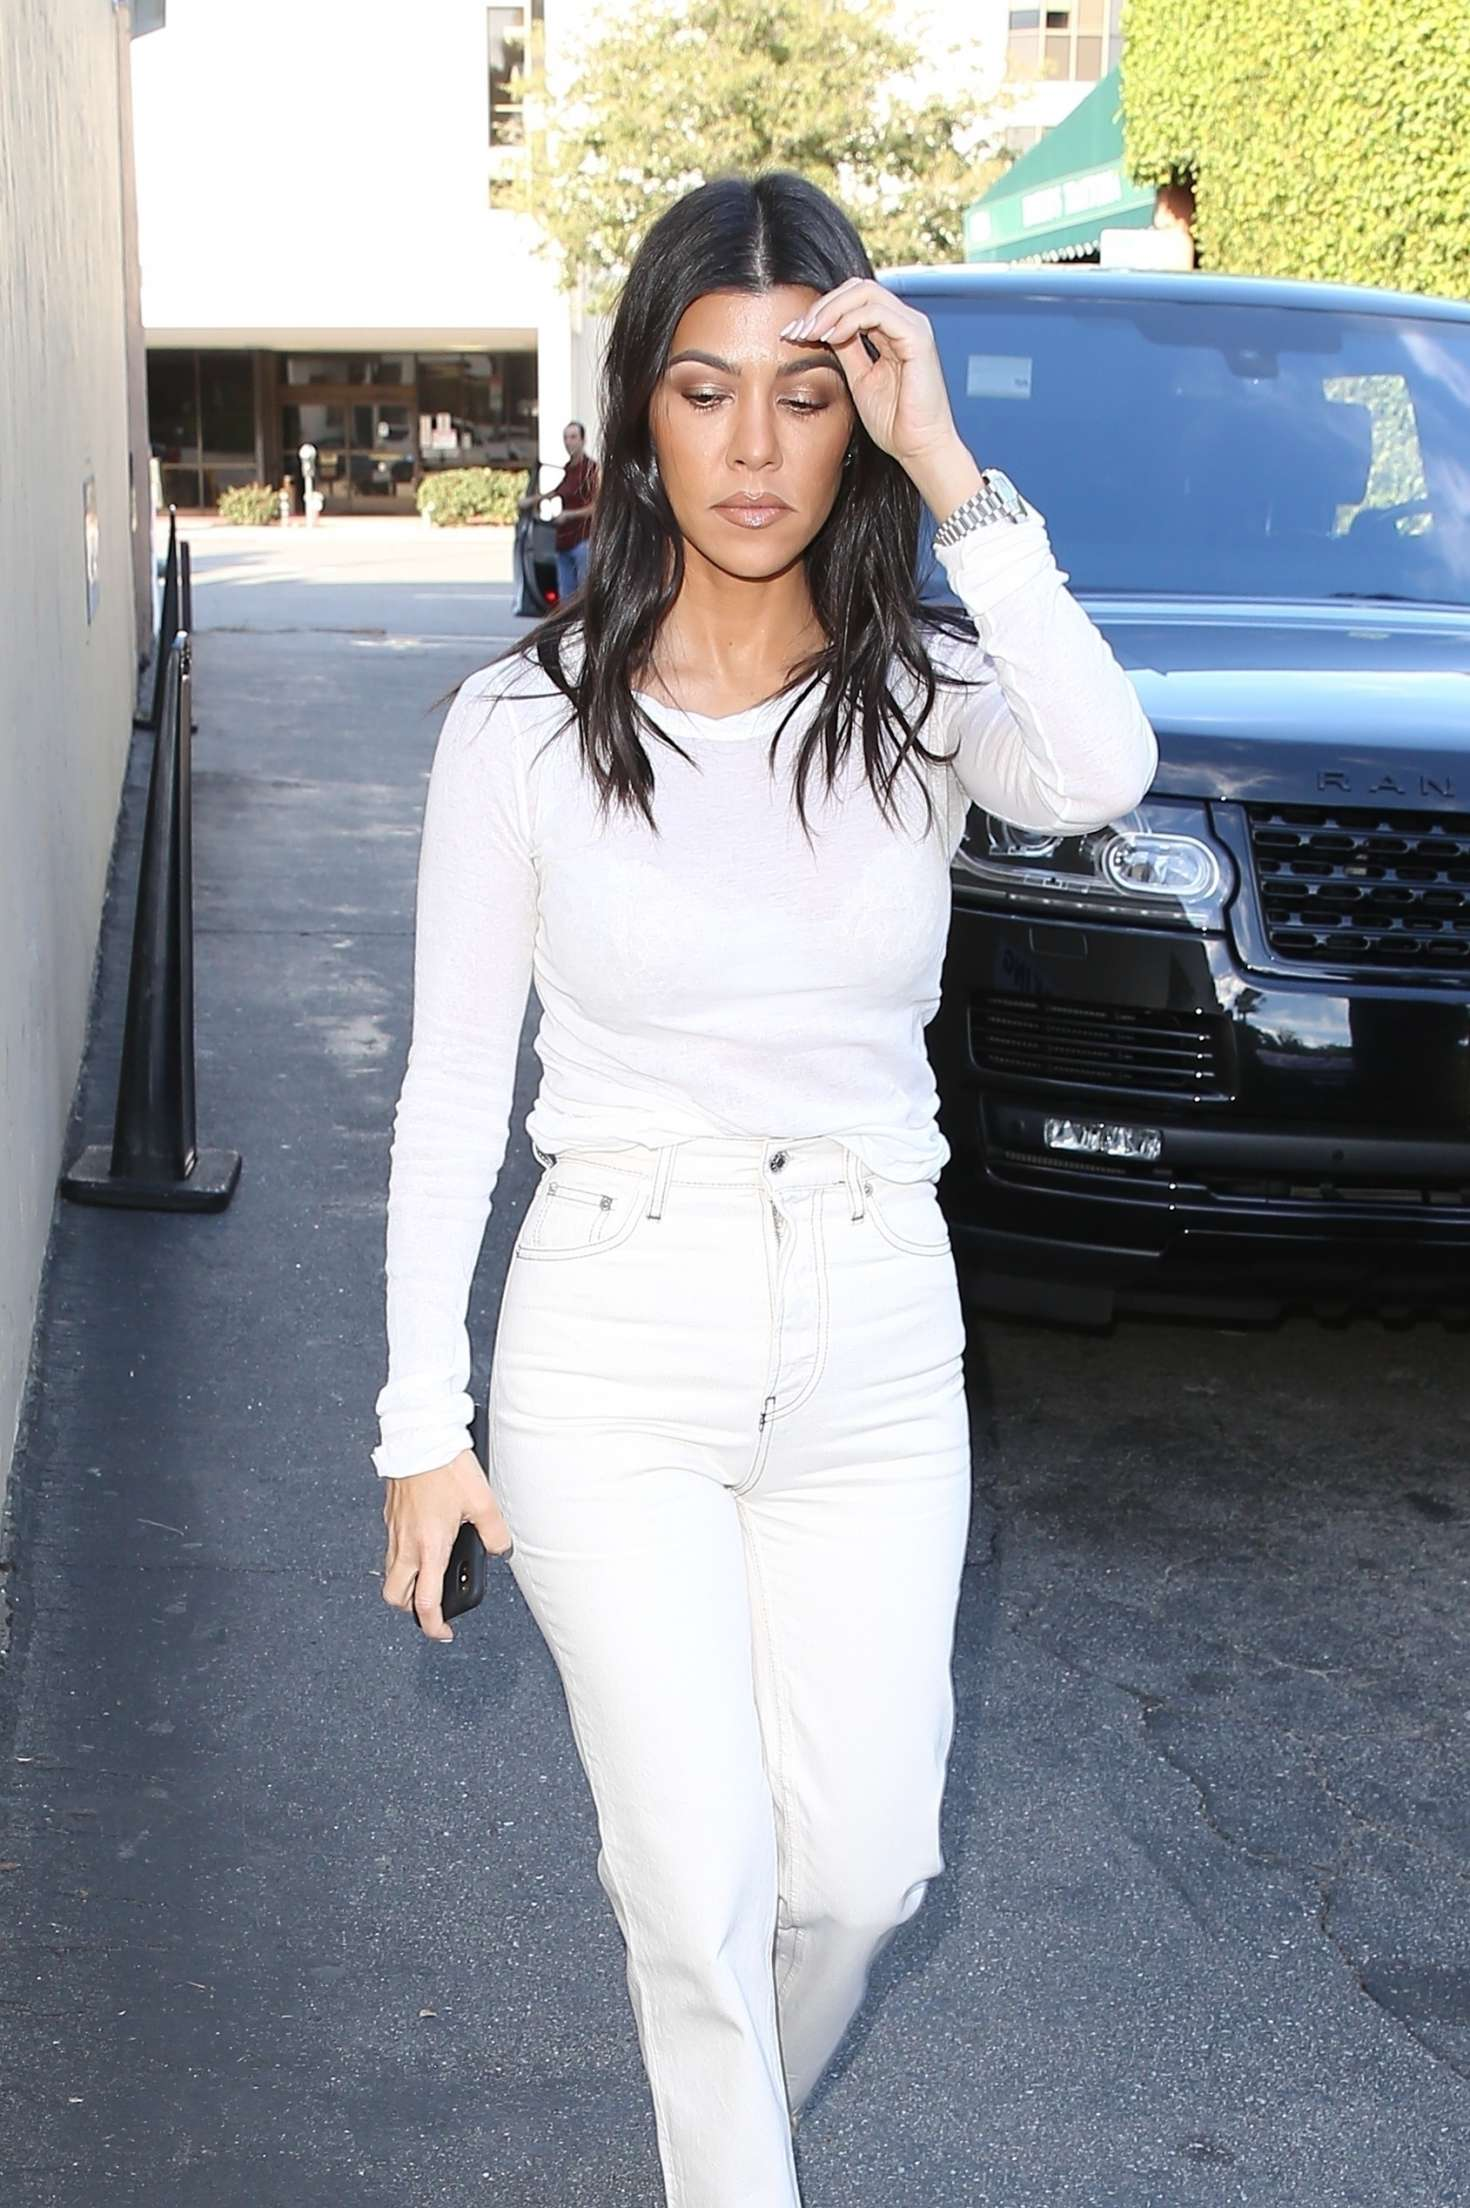 Kourtney Kardashian 2018 : Kourtney Kardashian in White -11